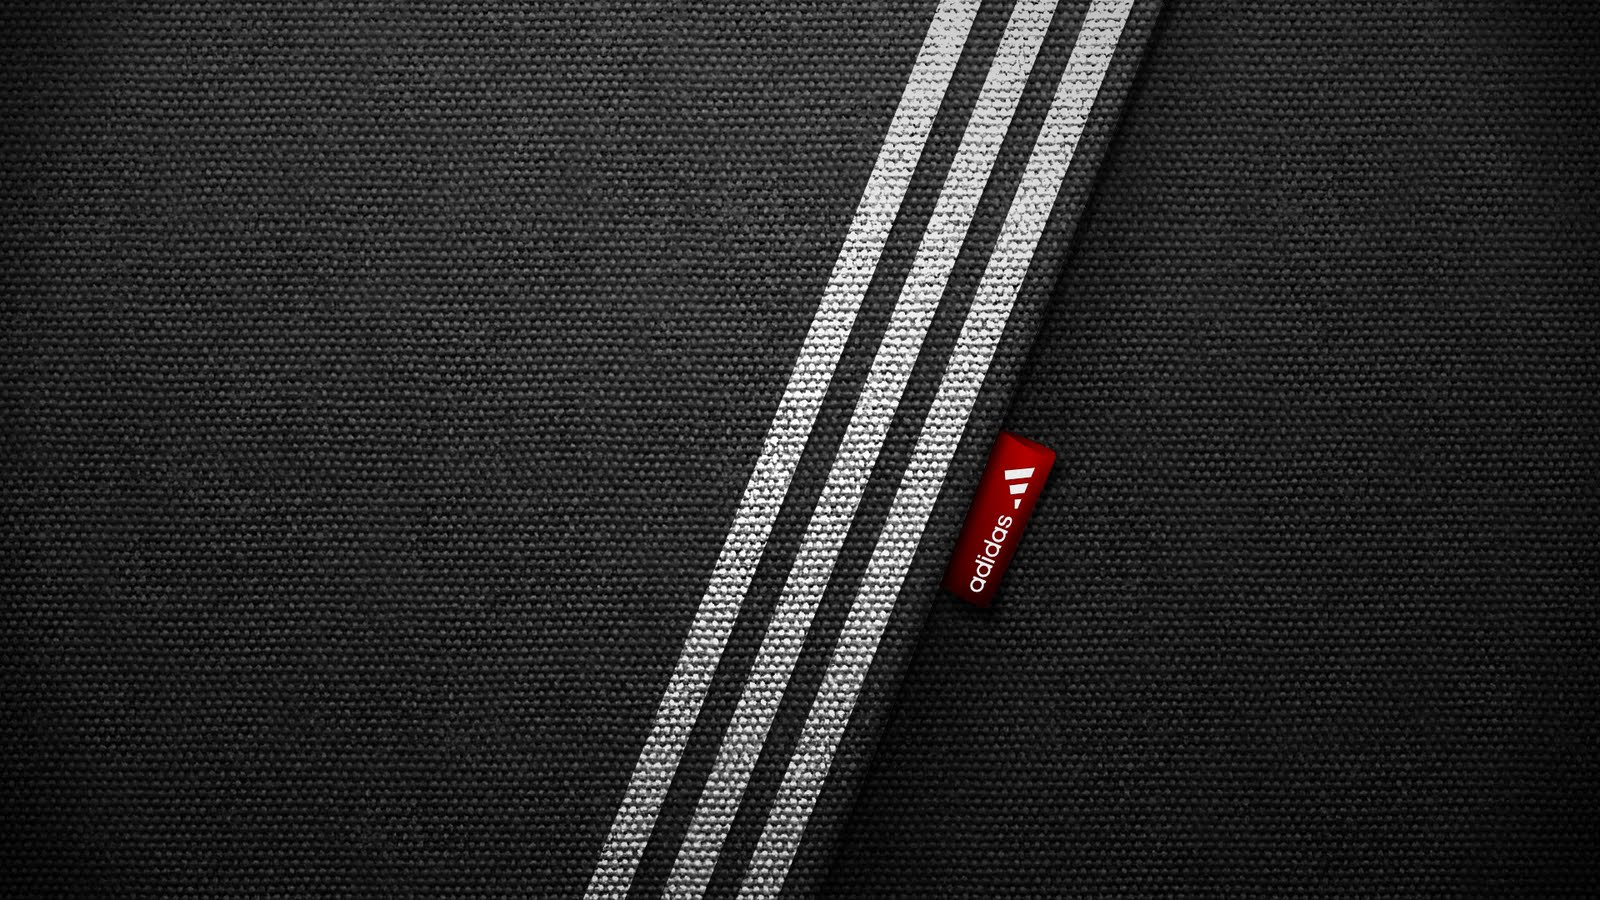 Adidas Original Wallpapers Wallpaper Cave